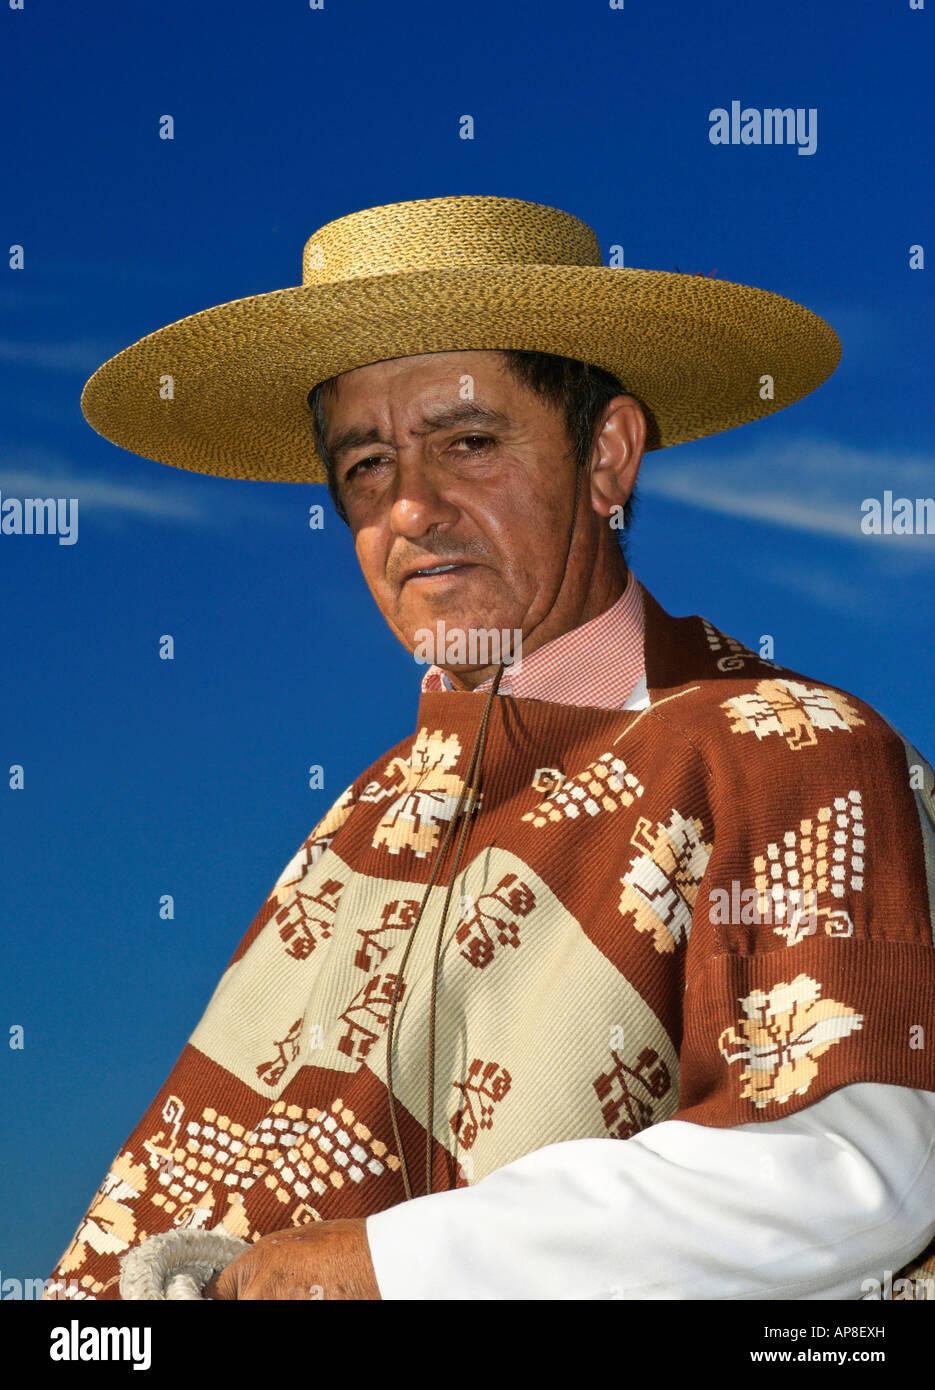 Huaso wearing traditional chupalla straw hat and poncho Chile Rapel - Stock Image